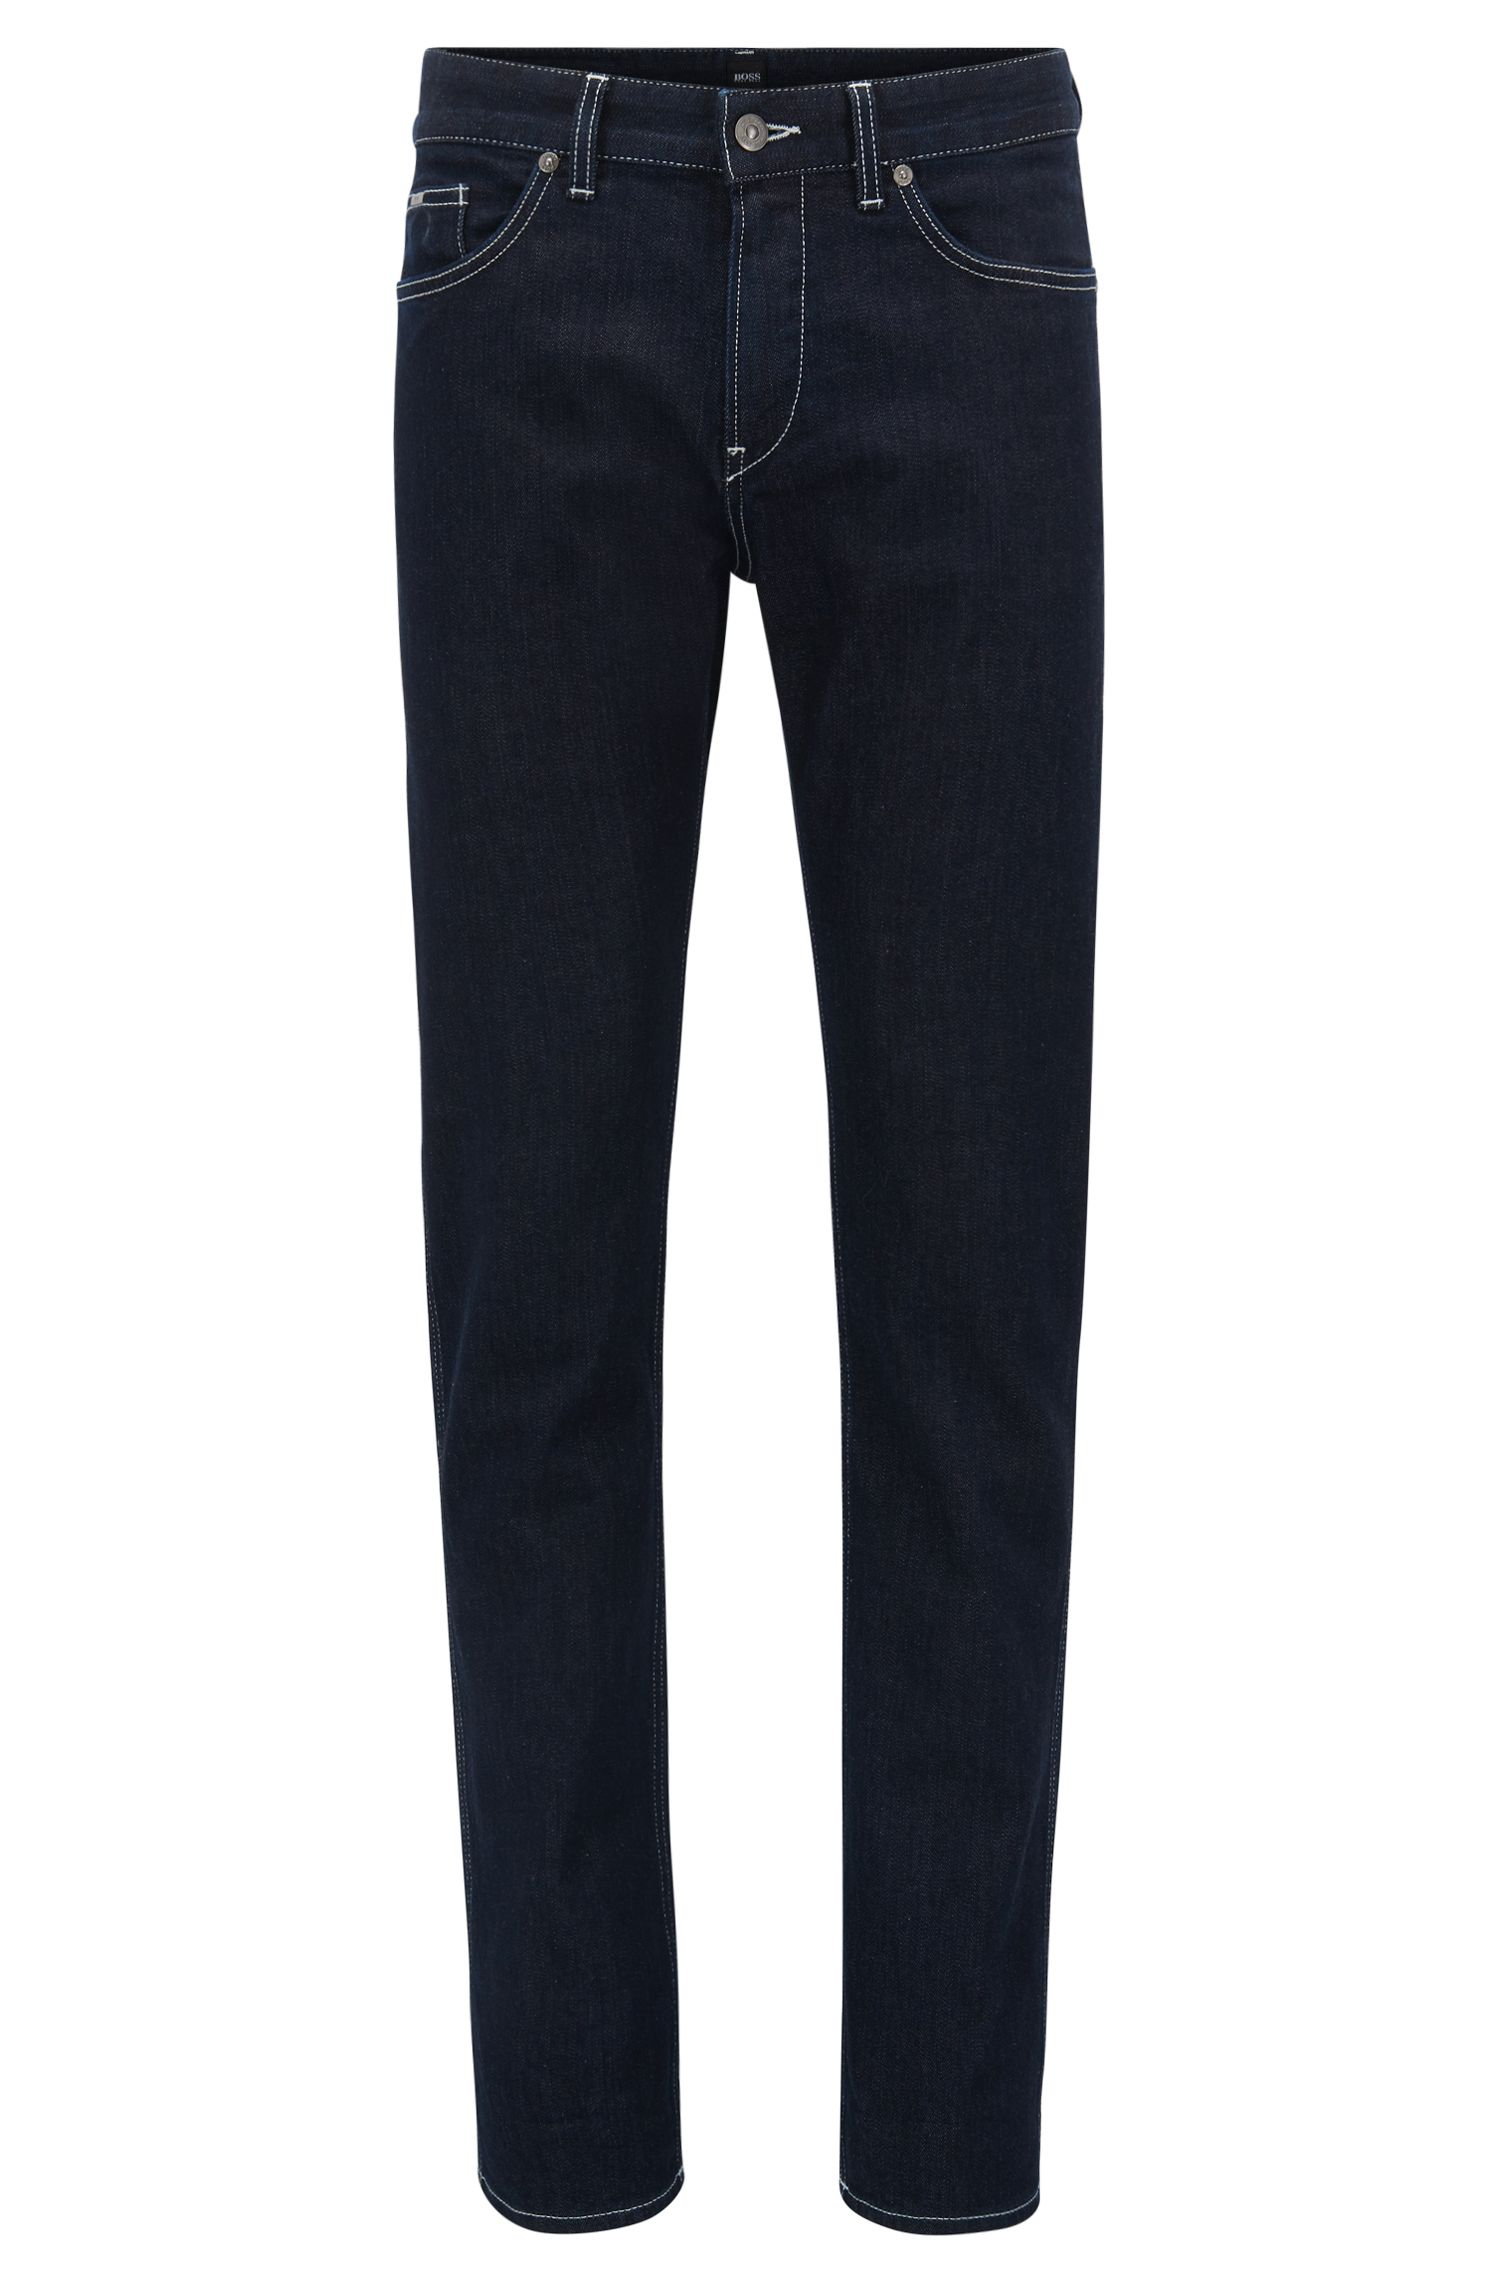 Slim-fit dark-blue stretch denim jeans with internal pattern